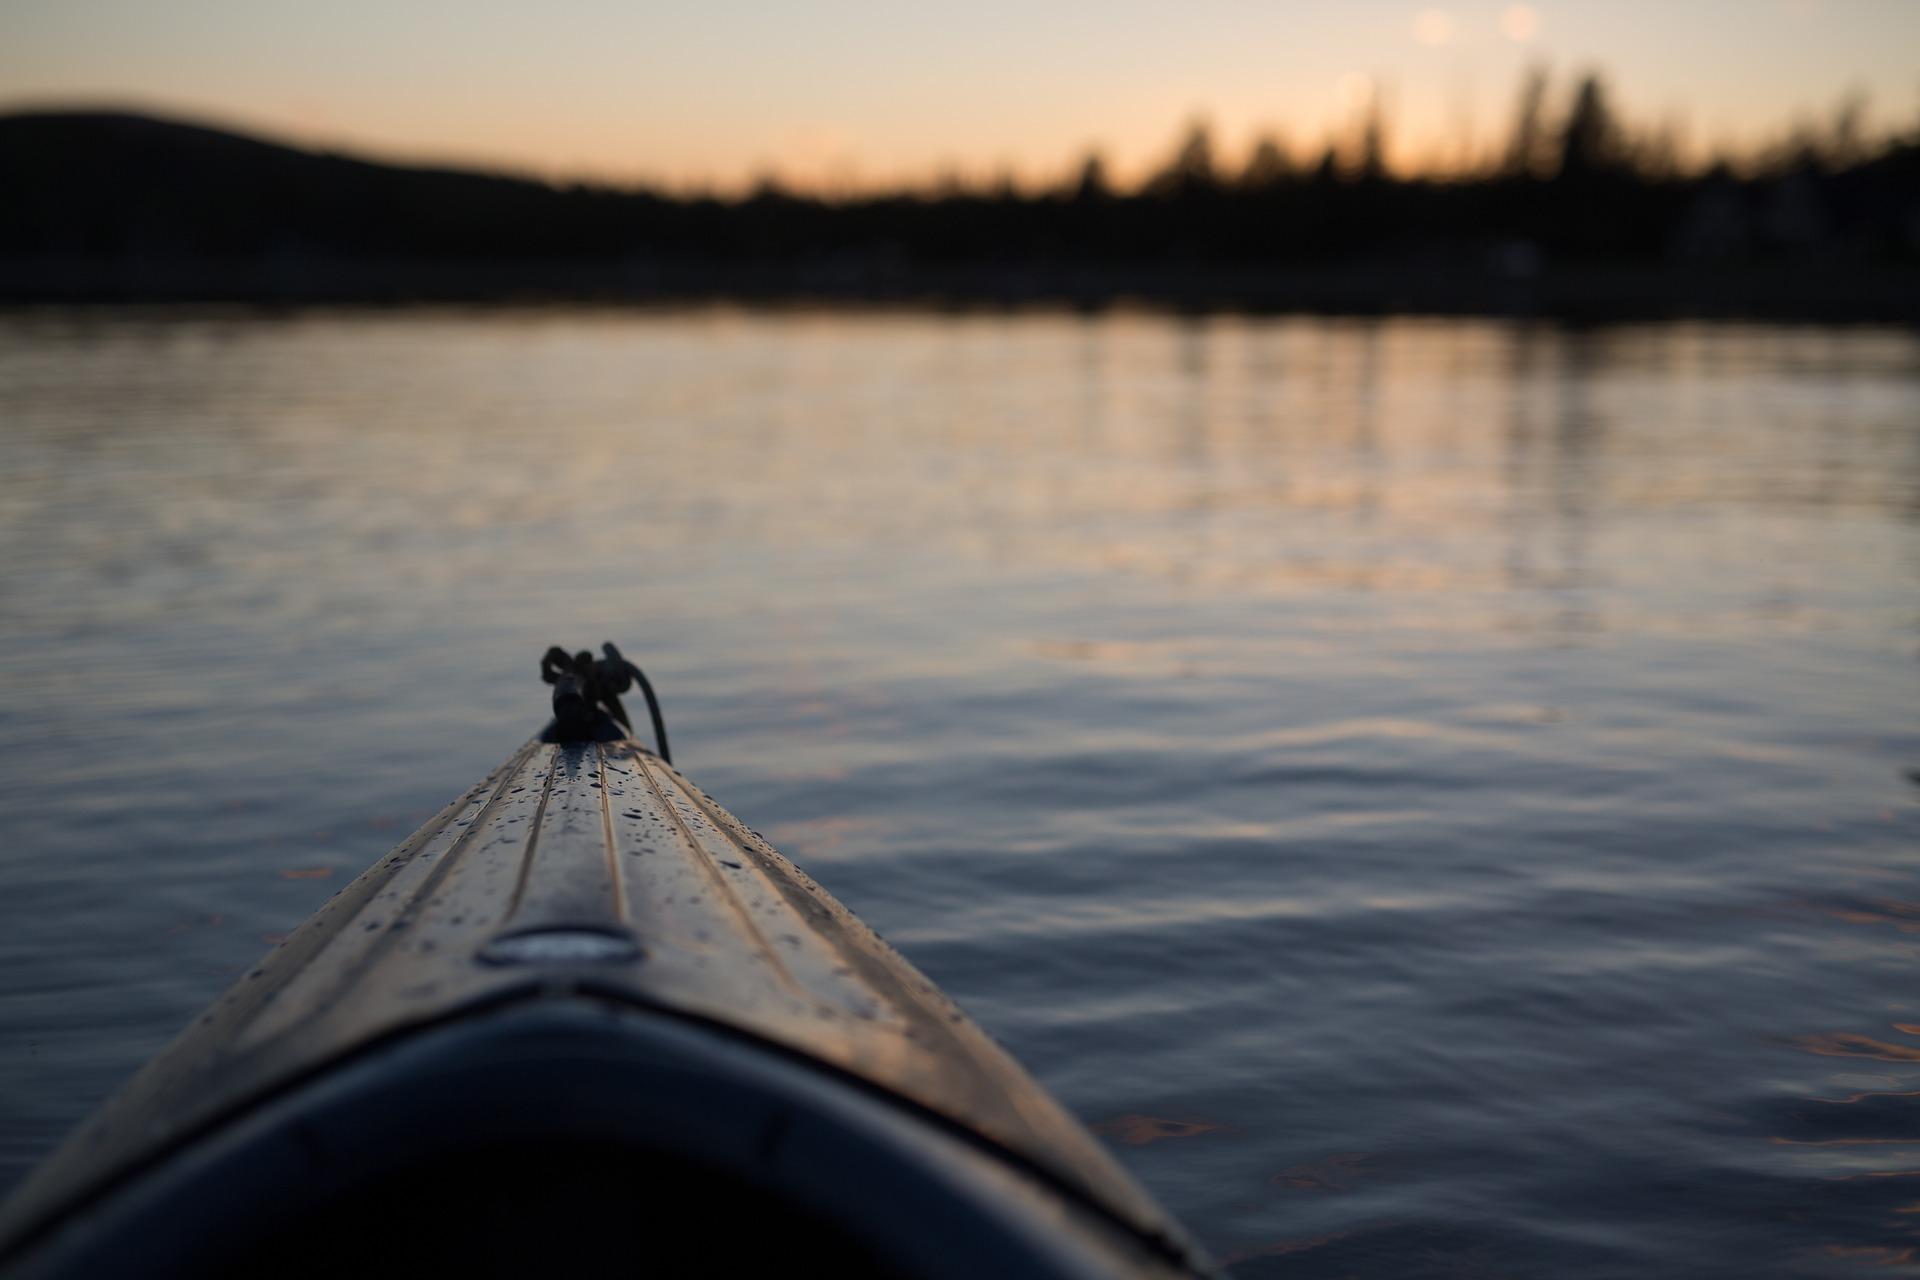 canoe-1149501_1920